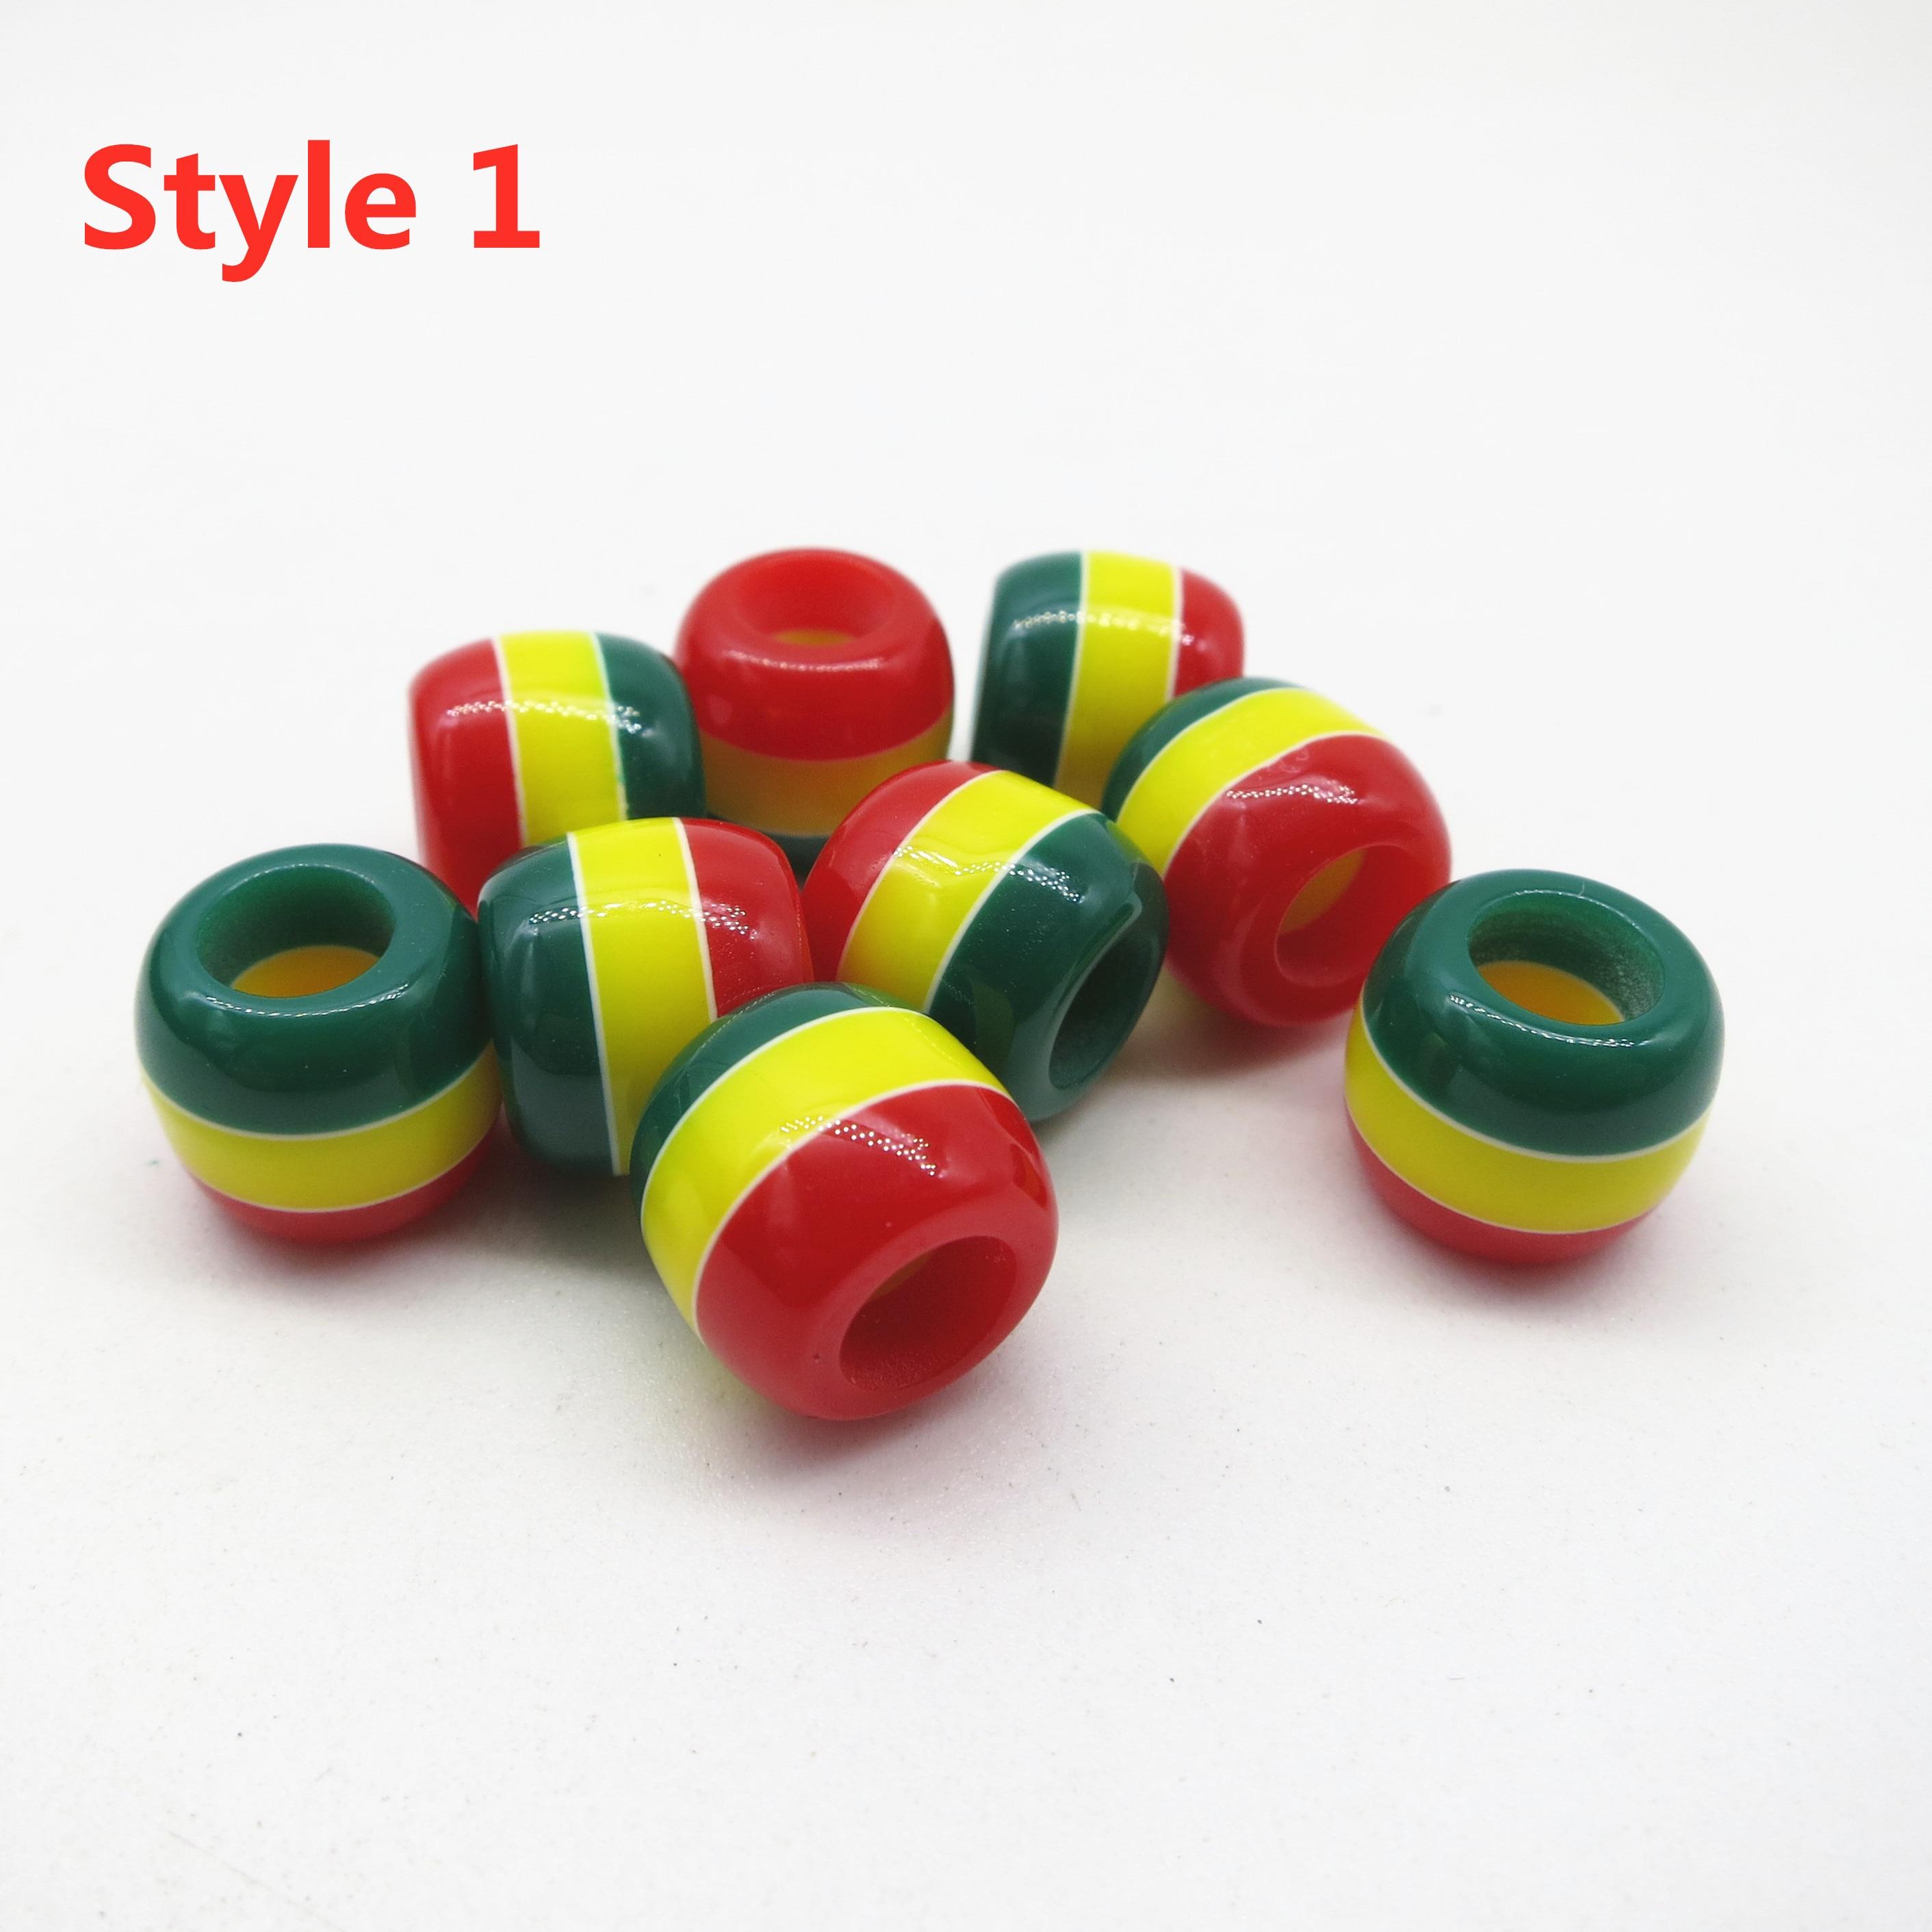 30Pcs-100pcs Crochet Braids Multicoloured different styles Rasta hair braid dread dreadlock Beads rings accessories